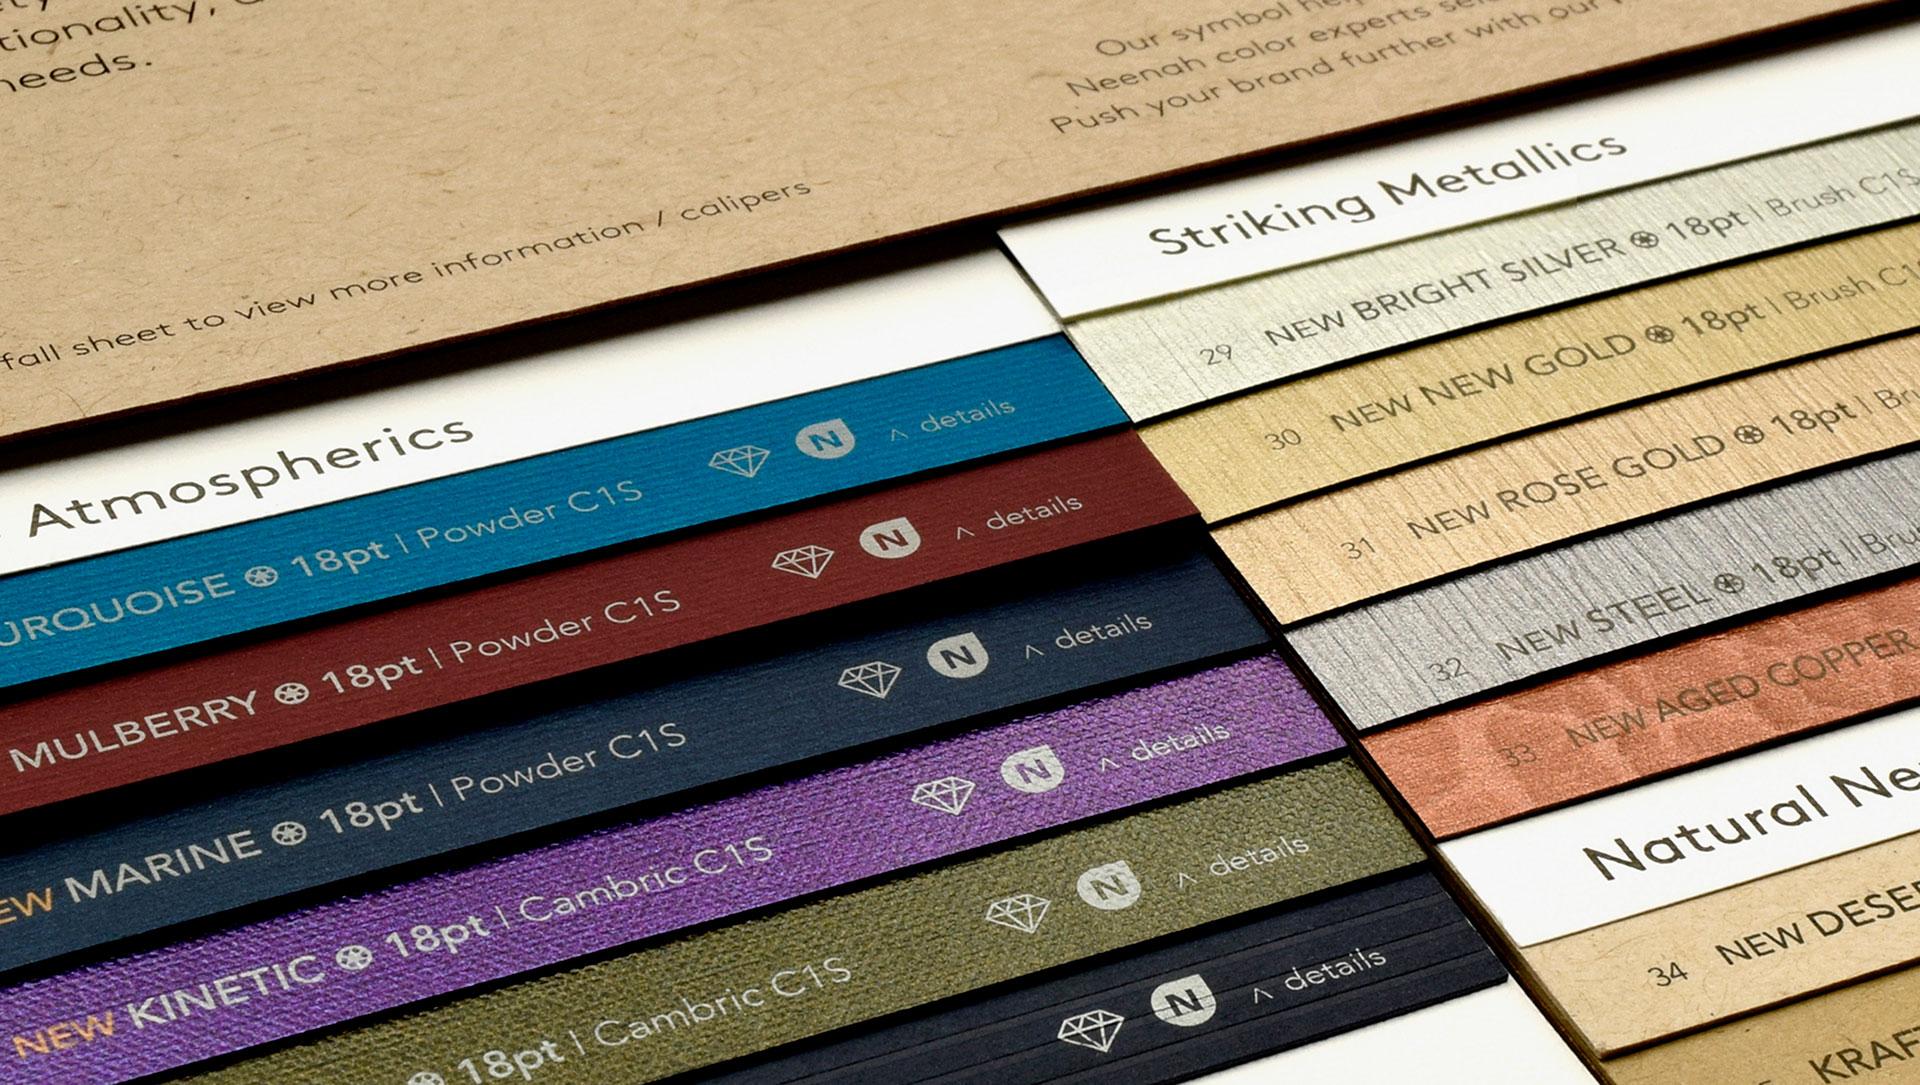 folding-board-metallics